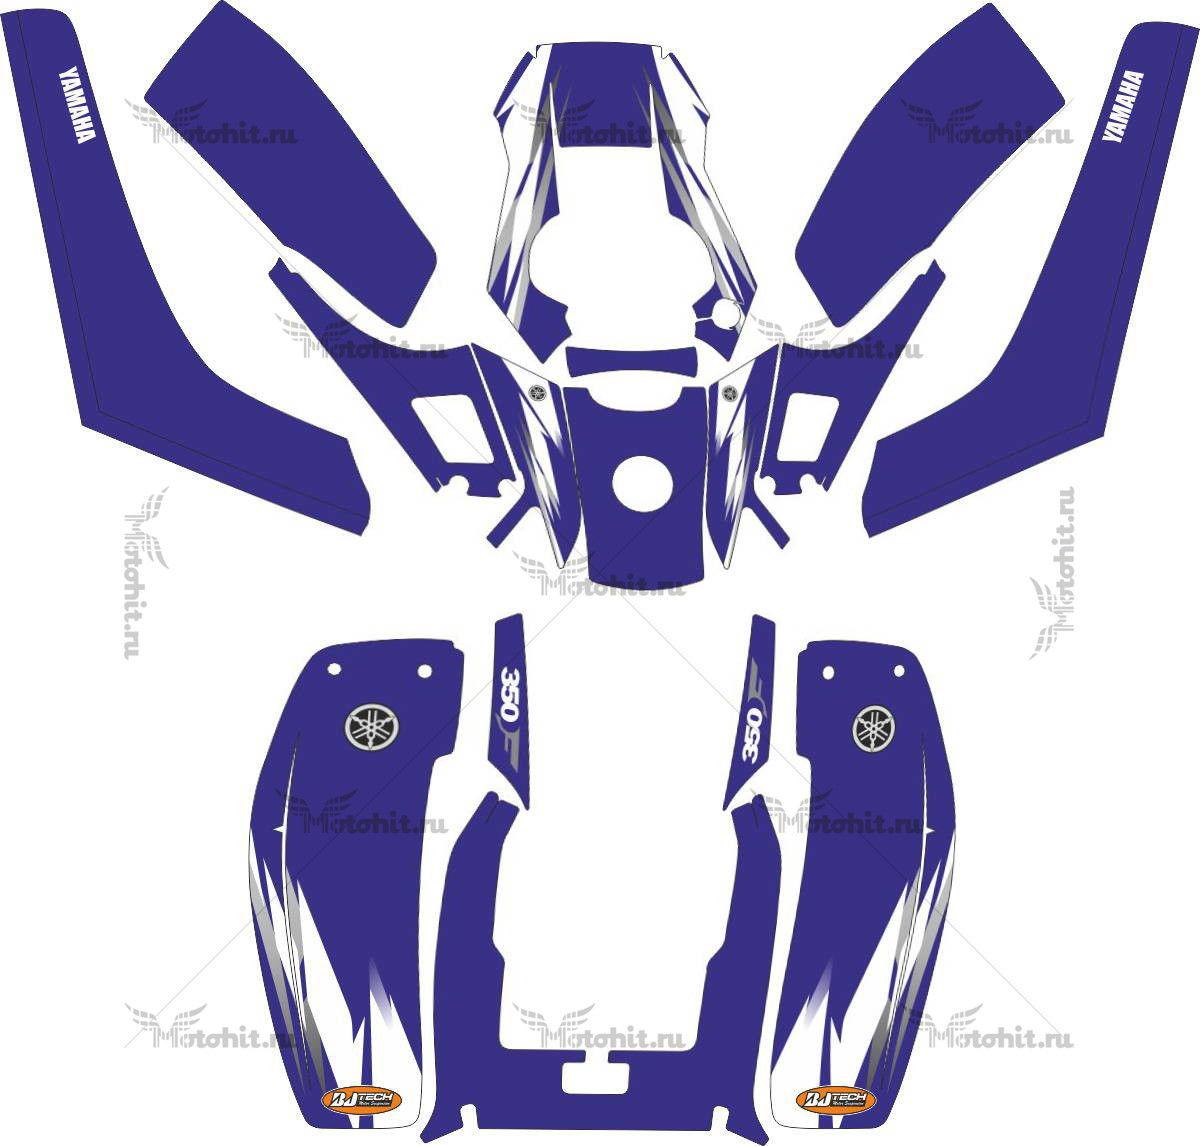 Комплект наклеек Yamaha WARRIOR-350 ALLSIGN